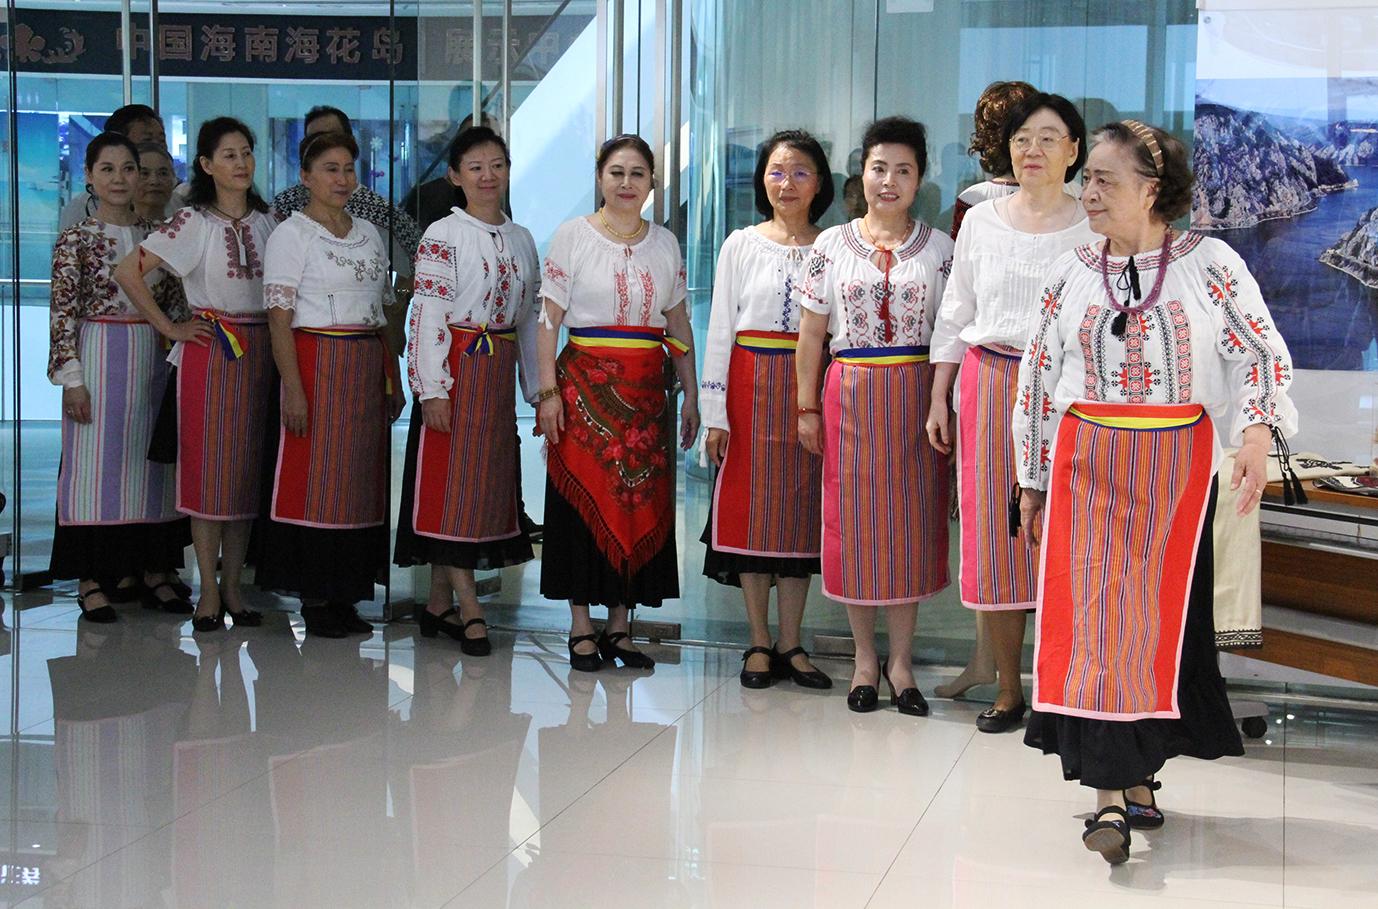 Ziua Universala a Iei celebrata la ICR Beijing 2017_dantomozeiRO 4